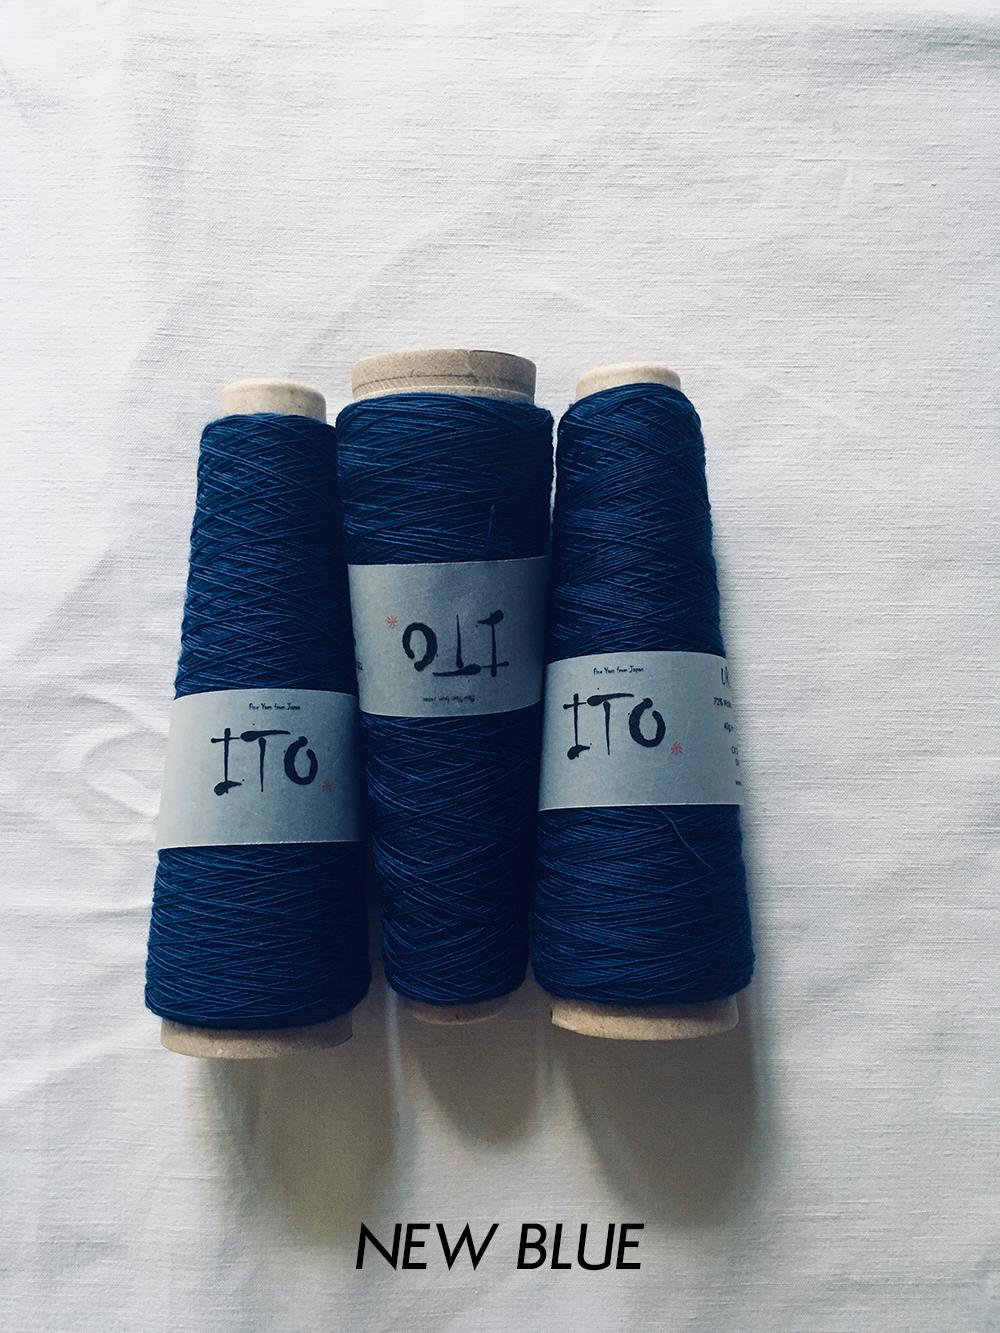 ito_urugami_new_blue_205_wool_done_knitting.jpg